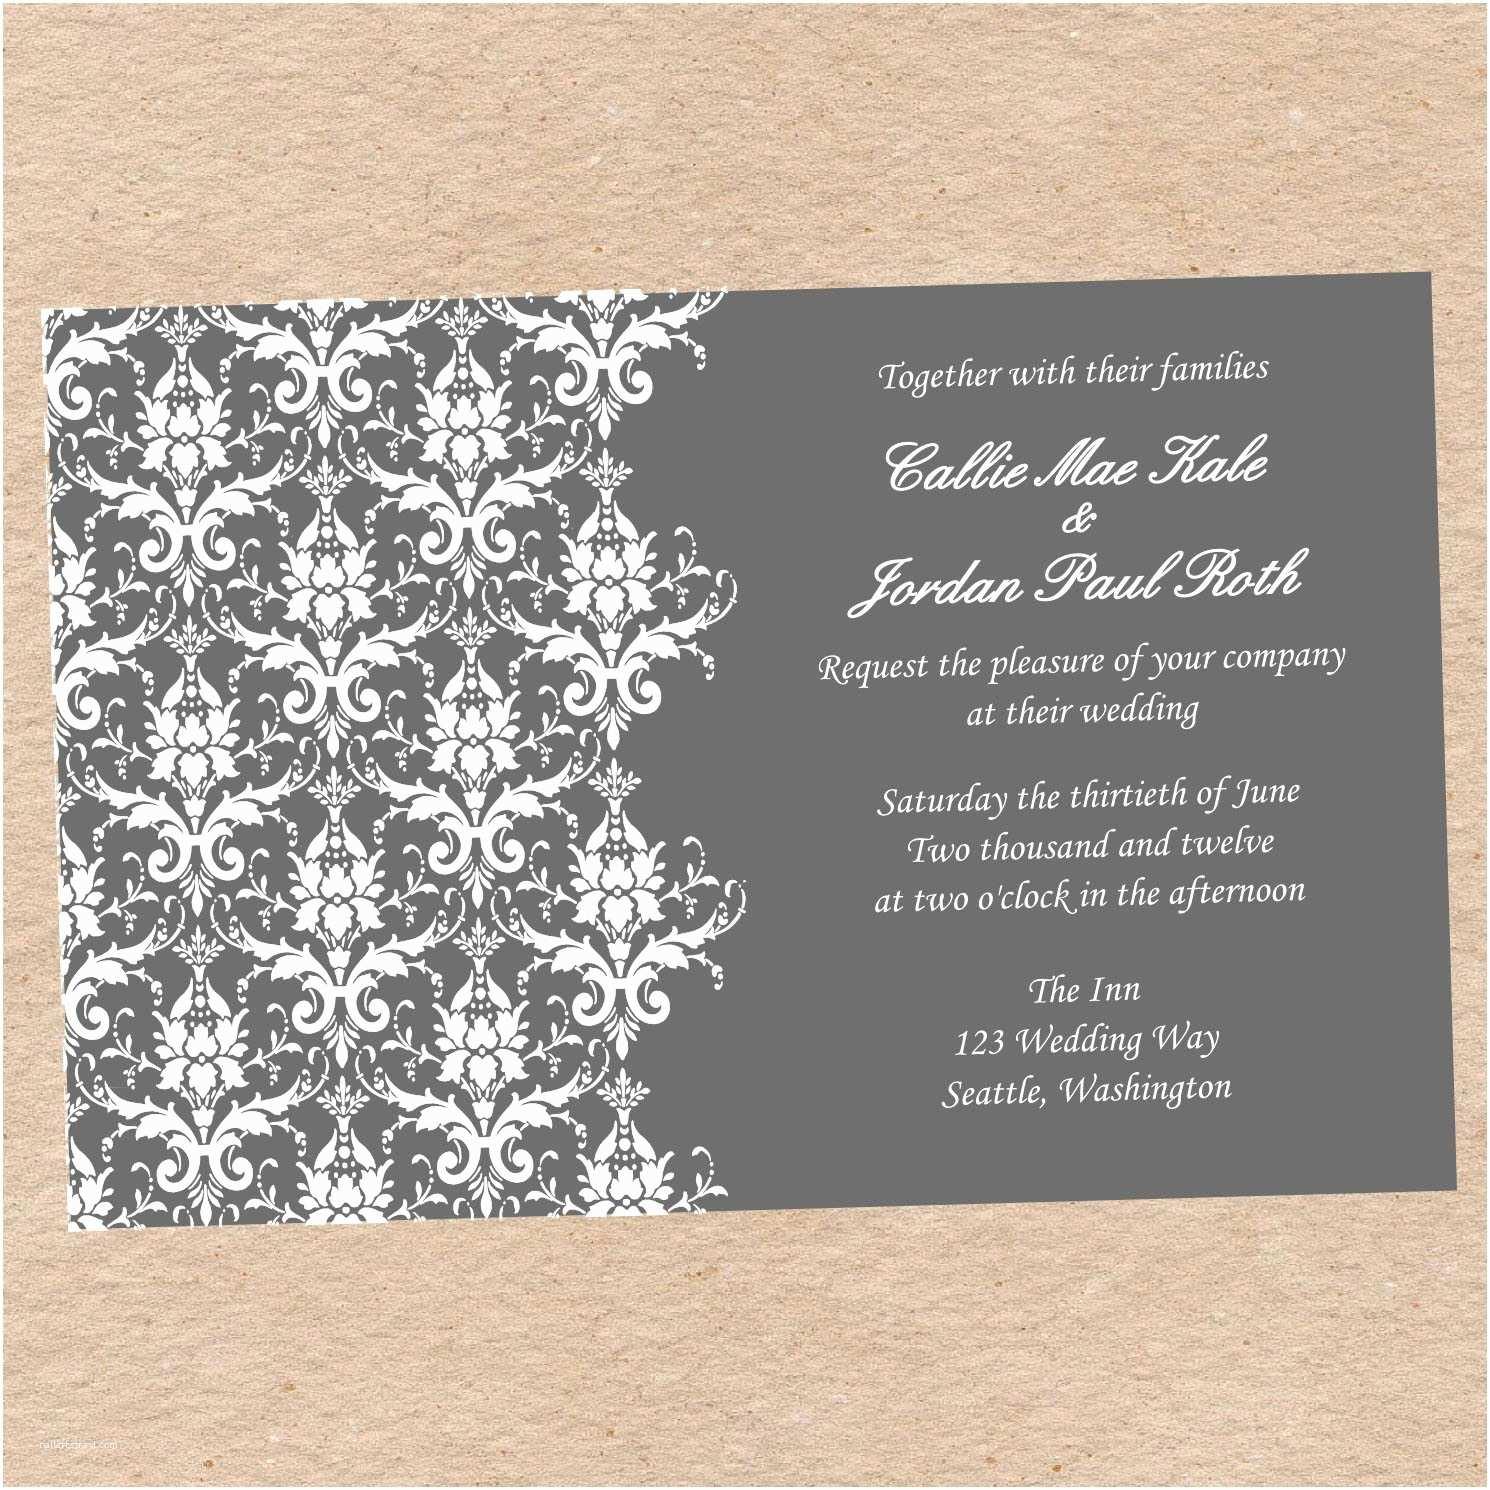 Wedding Invitation with Photo Templates Wedding Invitation Wedding Invitations Templates